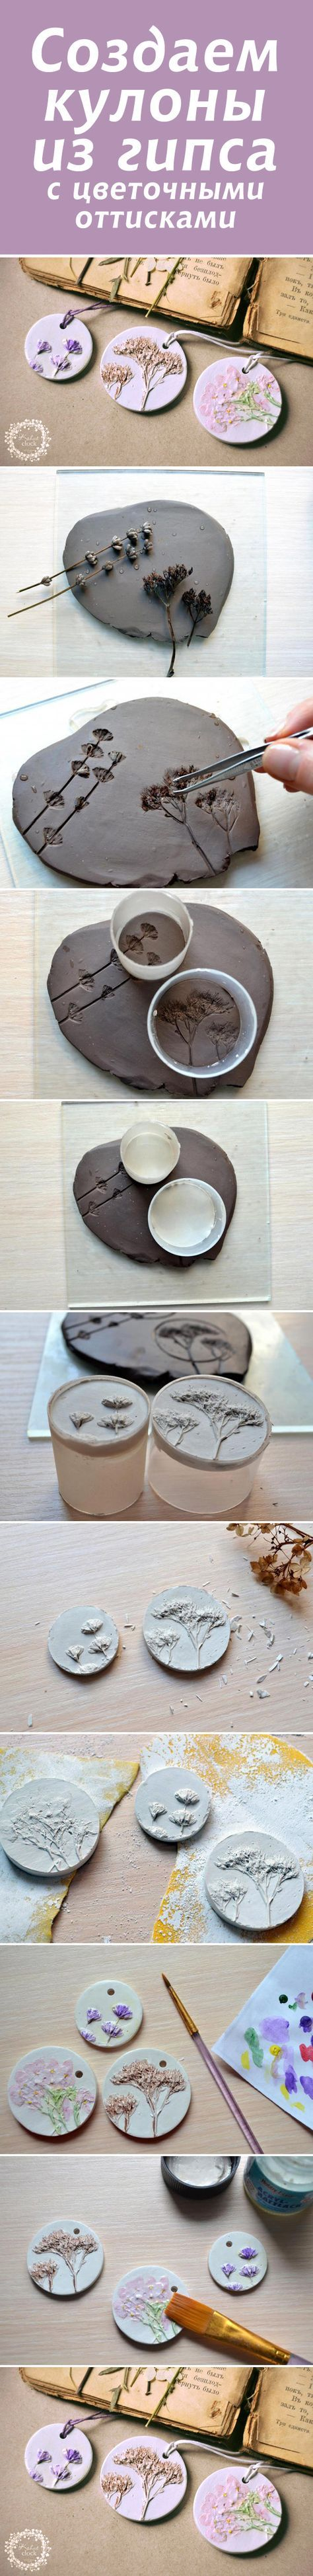 Plant molds